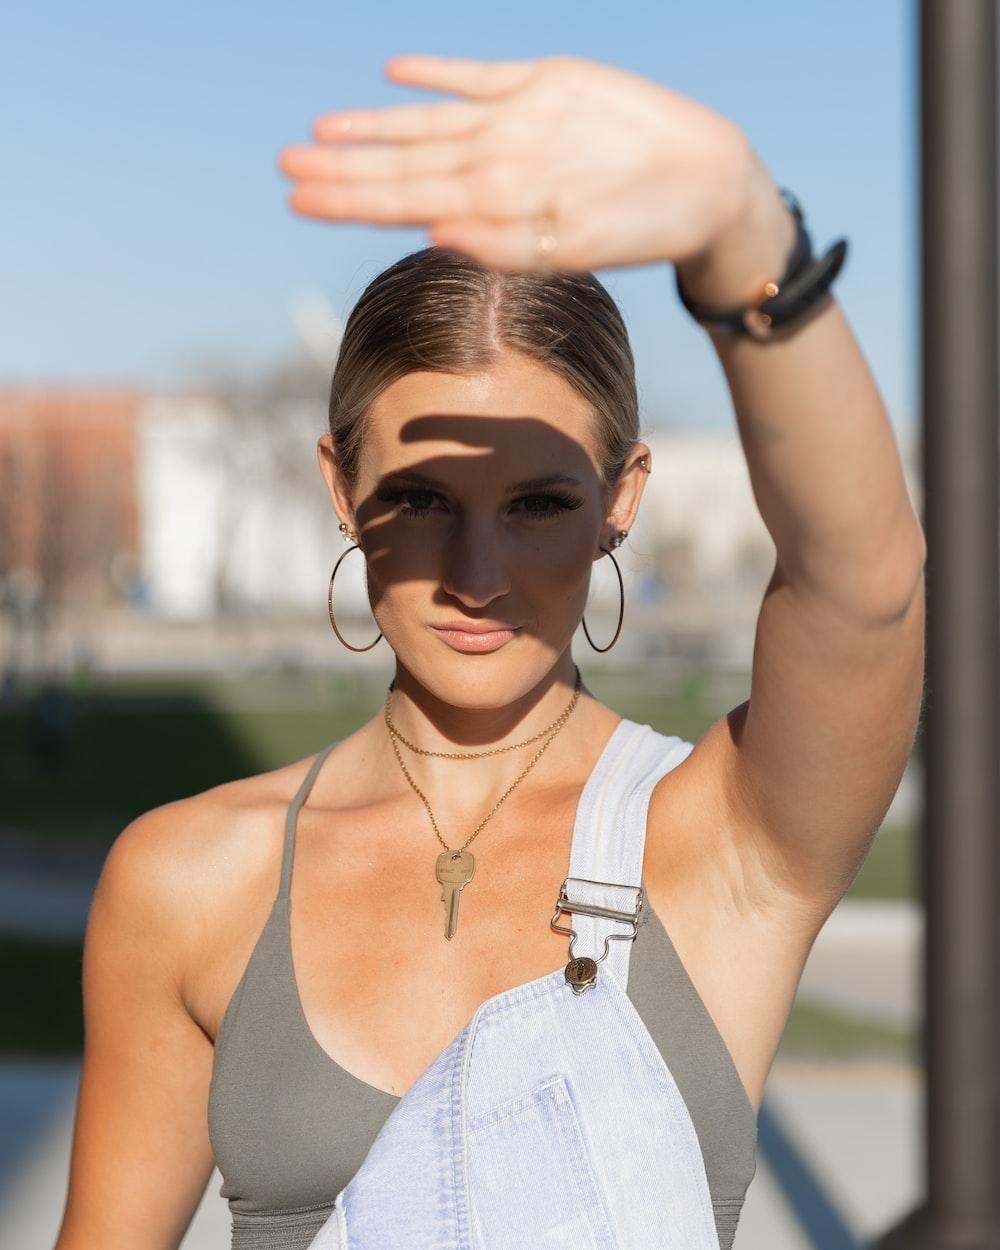 woman in gray tank top wearing black sunglasses